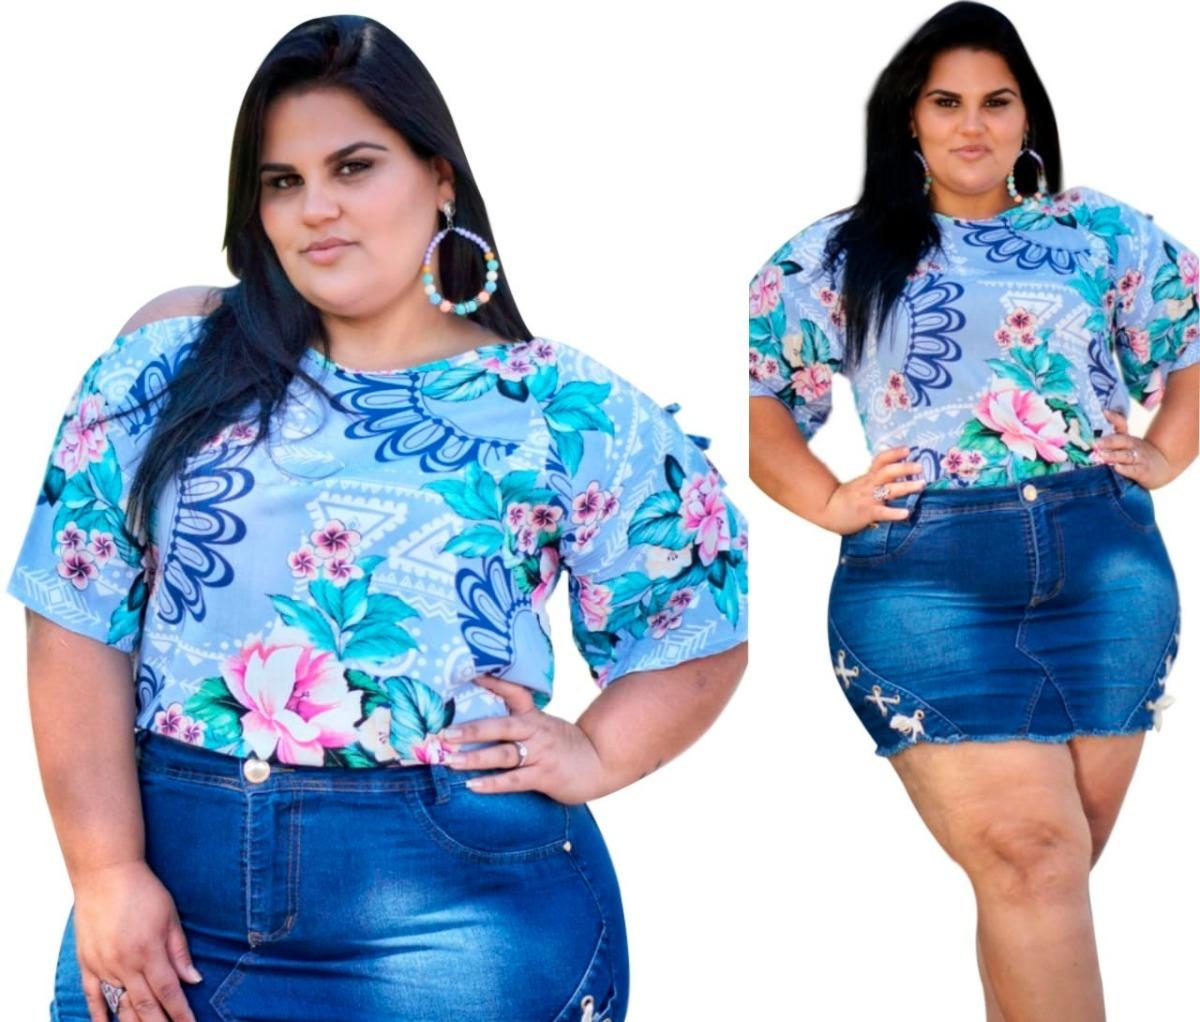 d97560f988 blusa bata regata feminina viscose plus size moda. Carregando zoom.